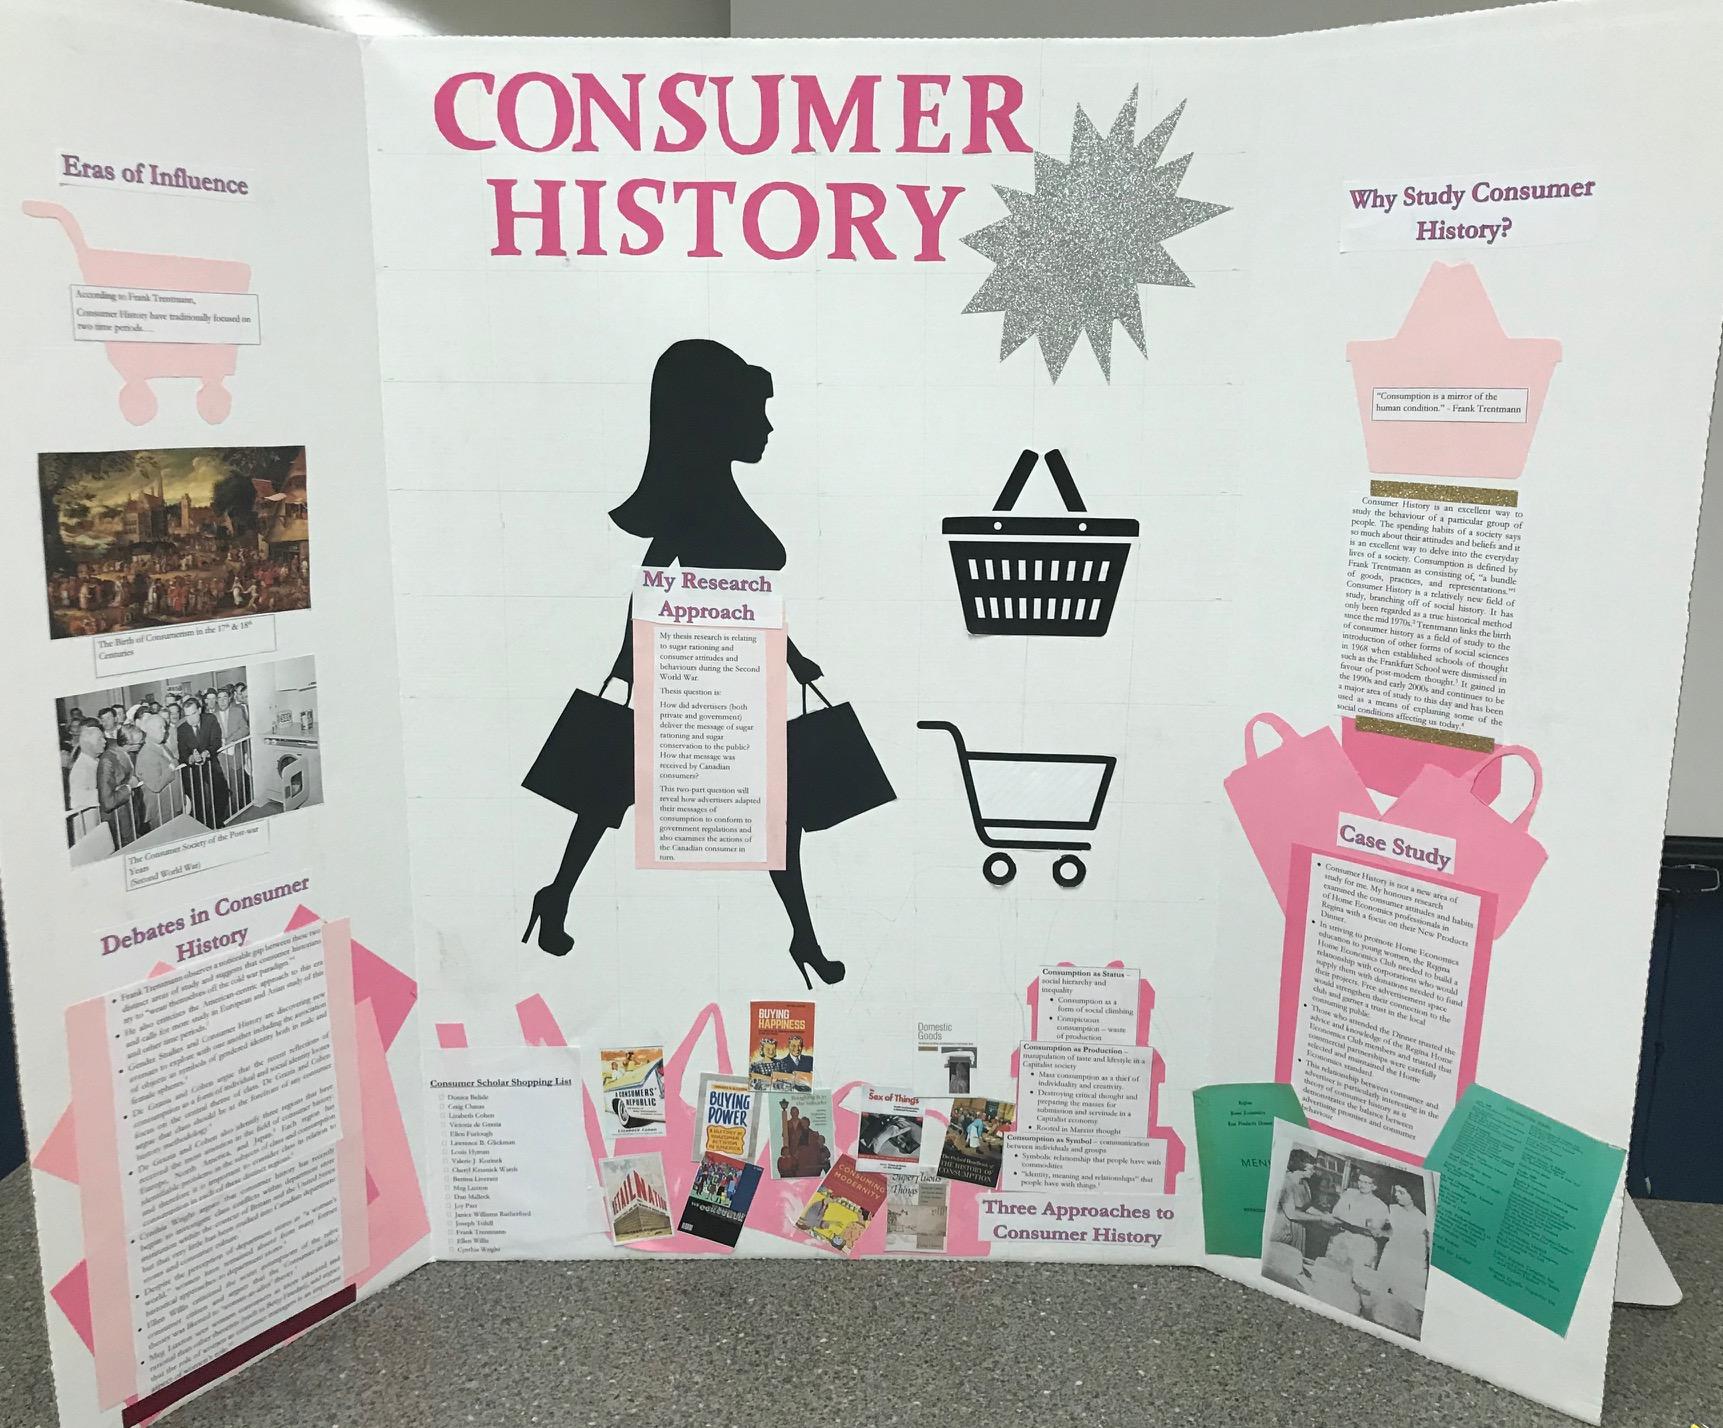 Consumer History